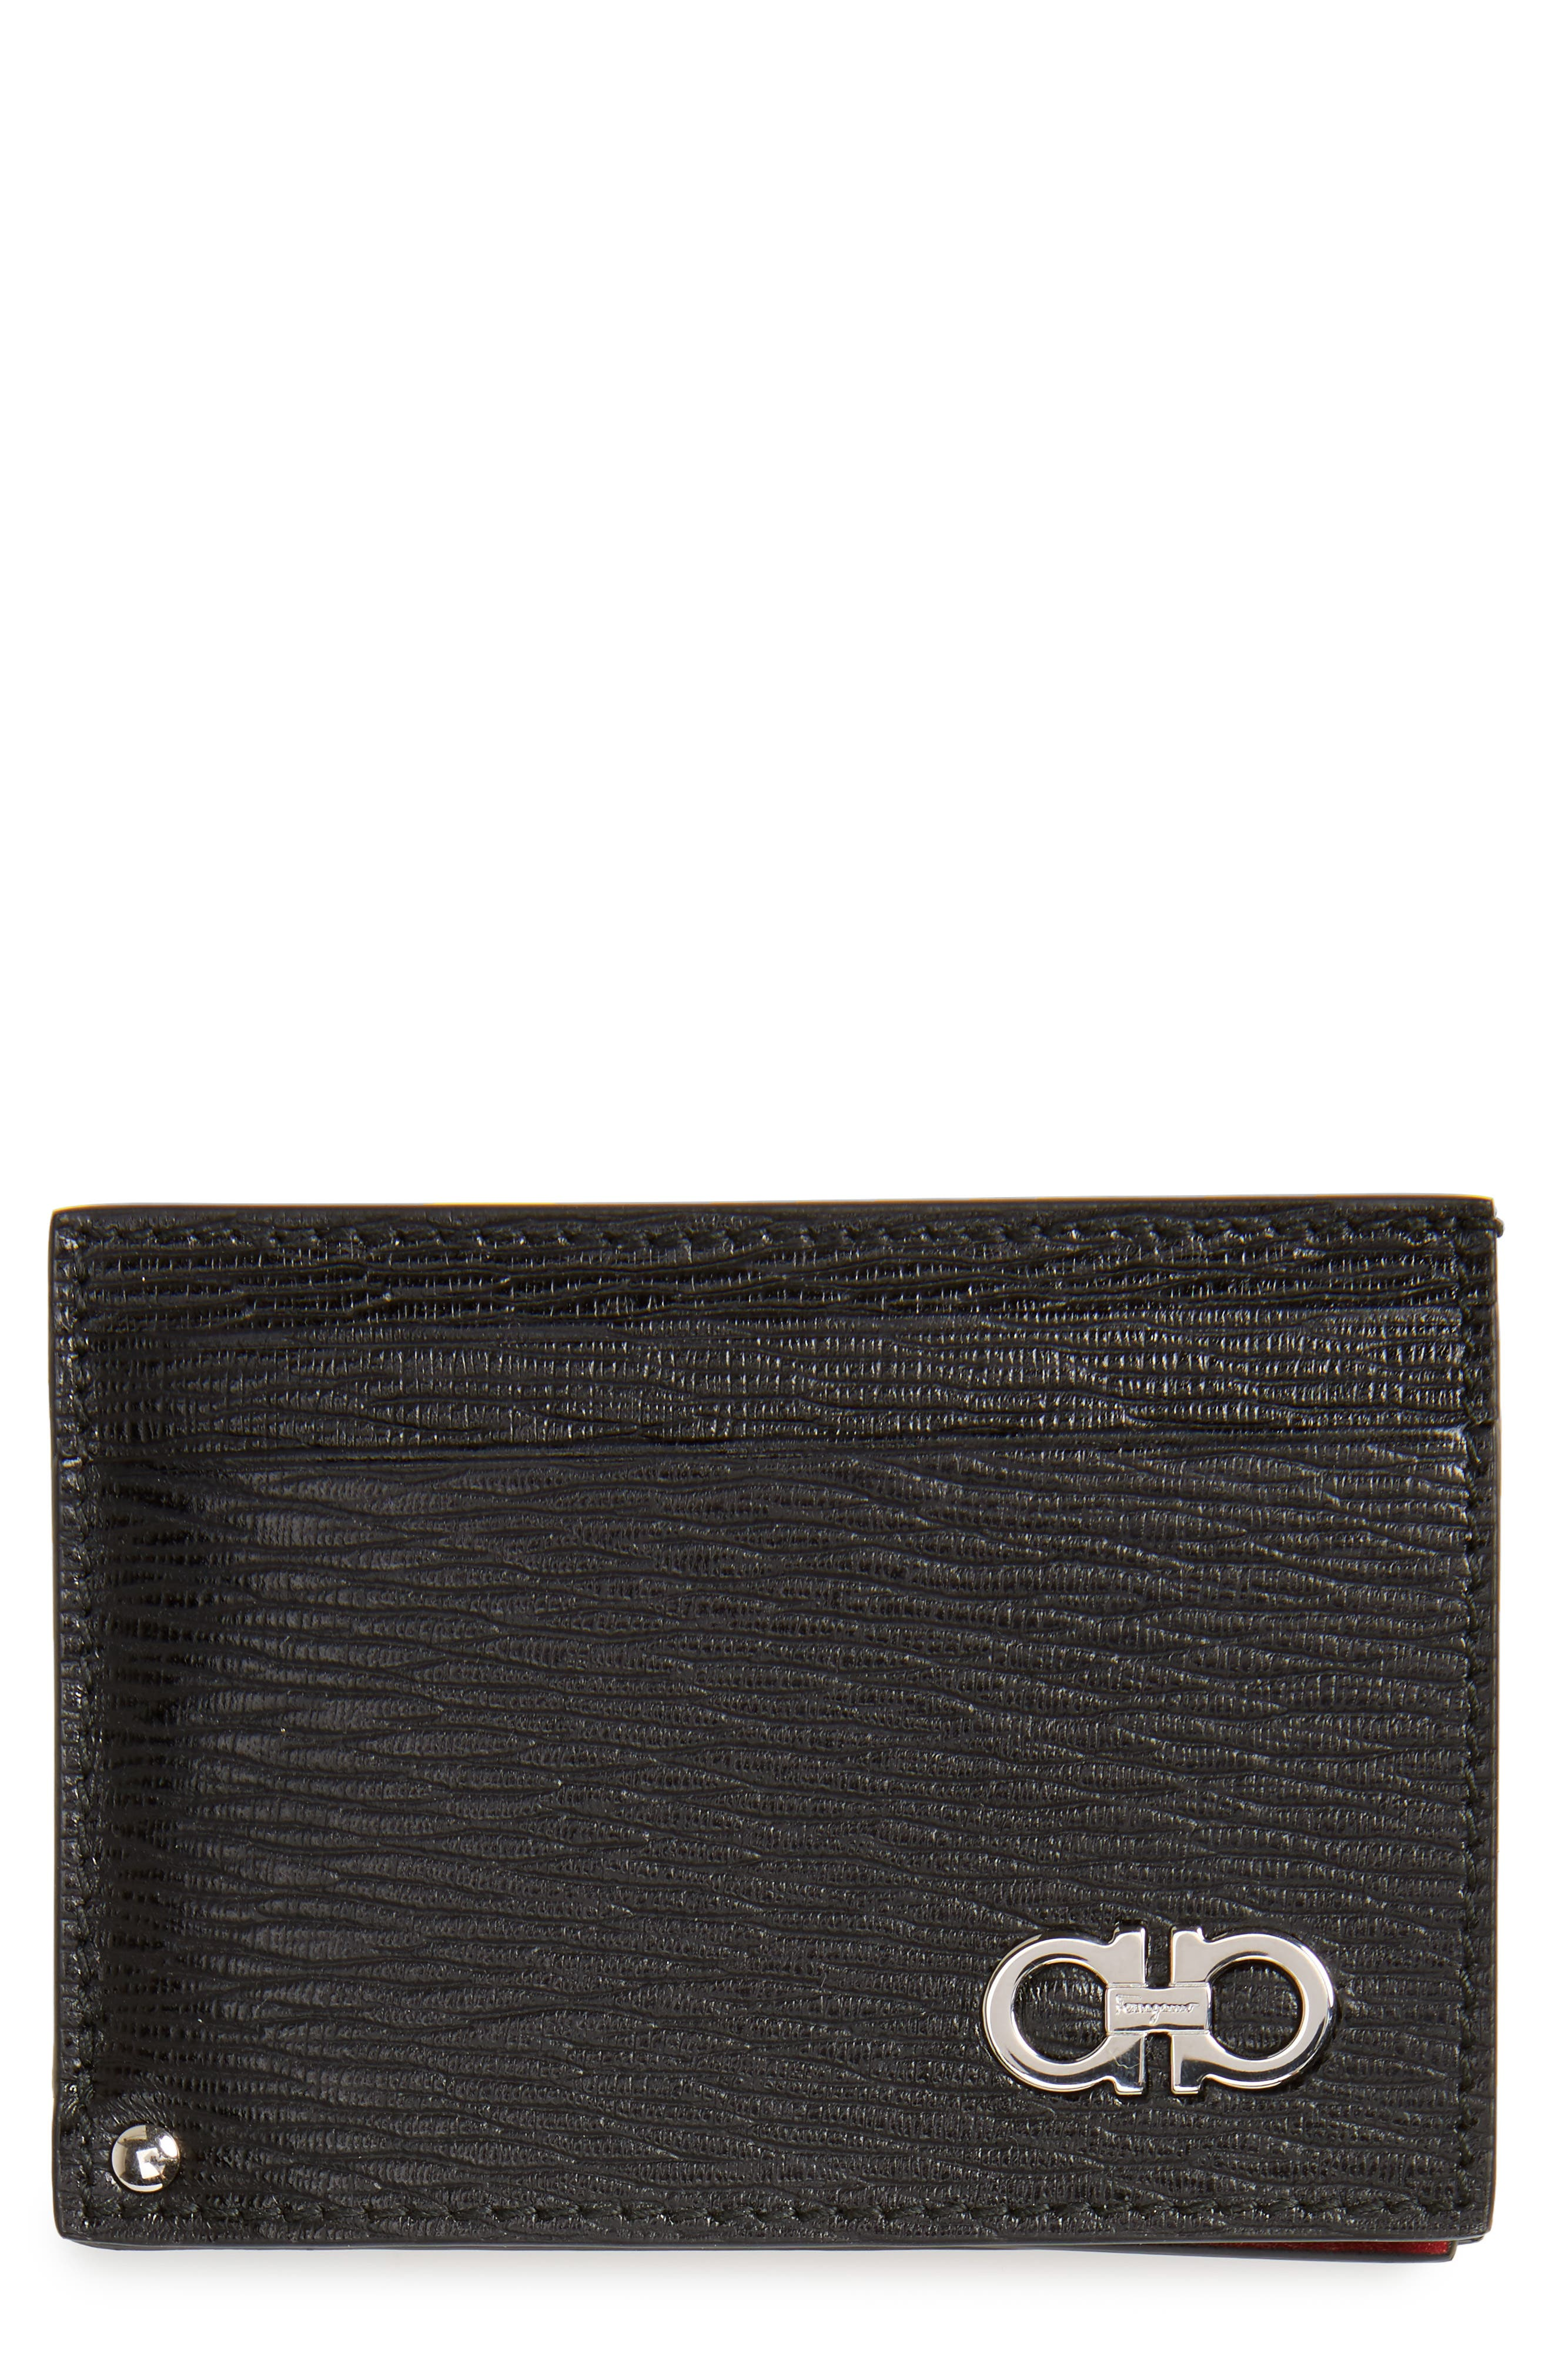 Revival Calfskin Leather Card Case,                             Main thumbnail 1, color,                             Black